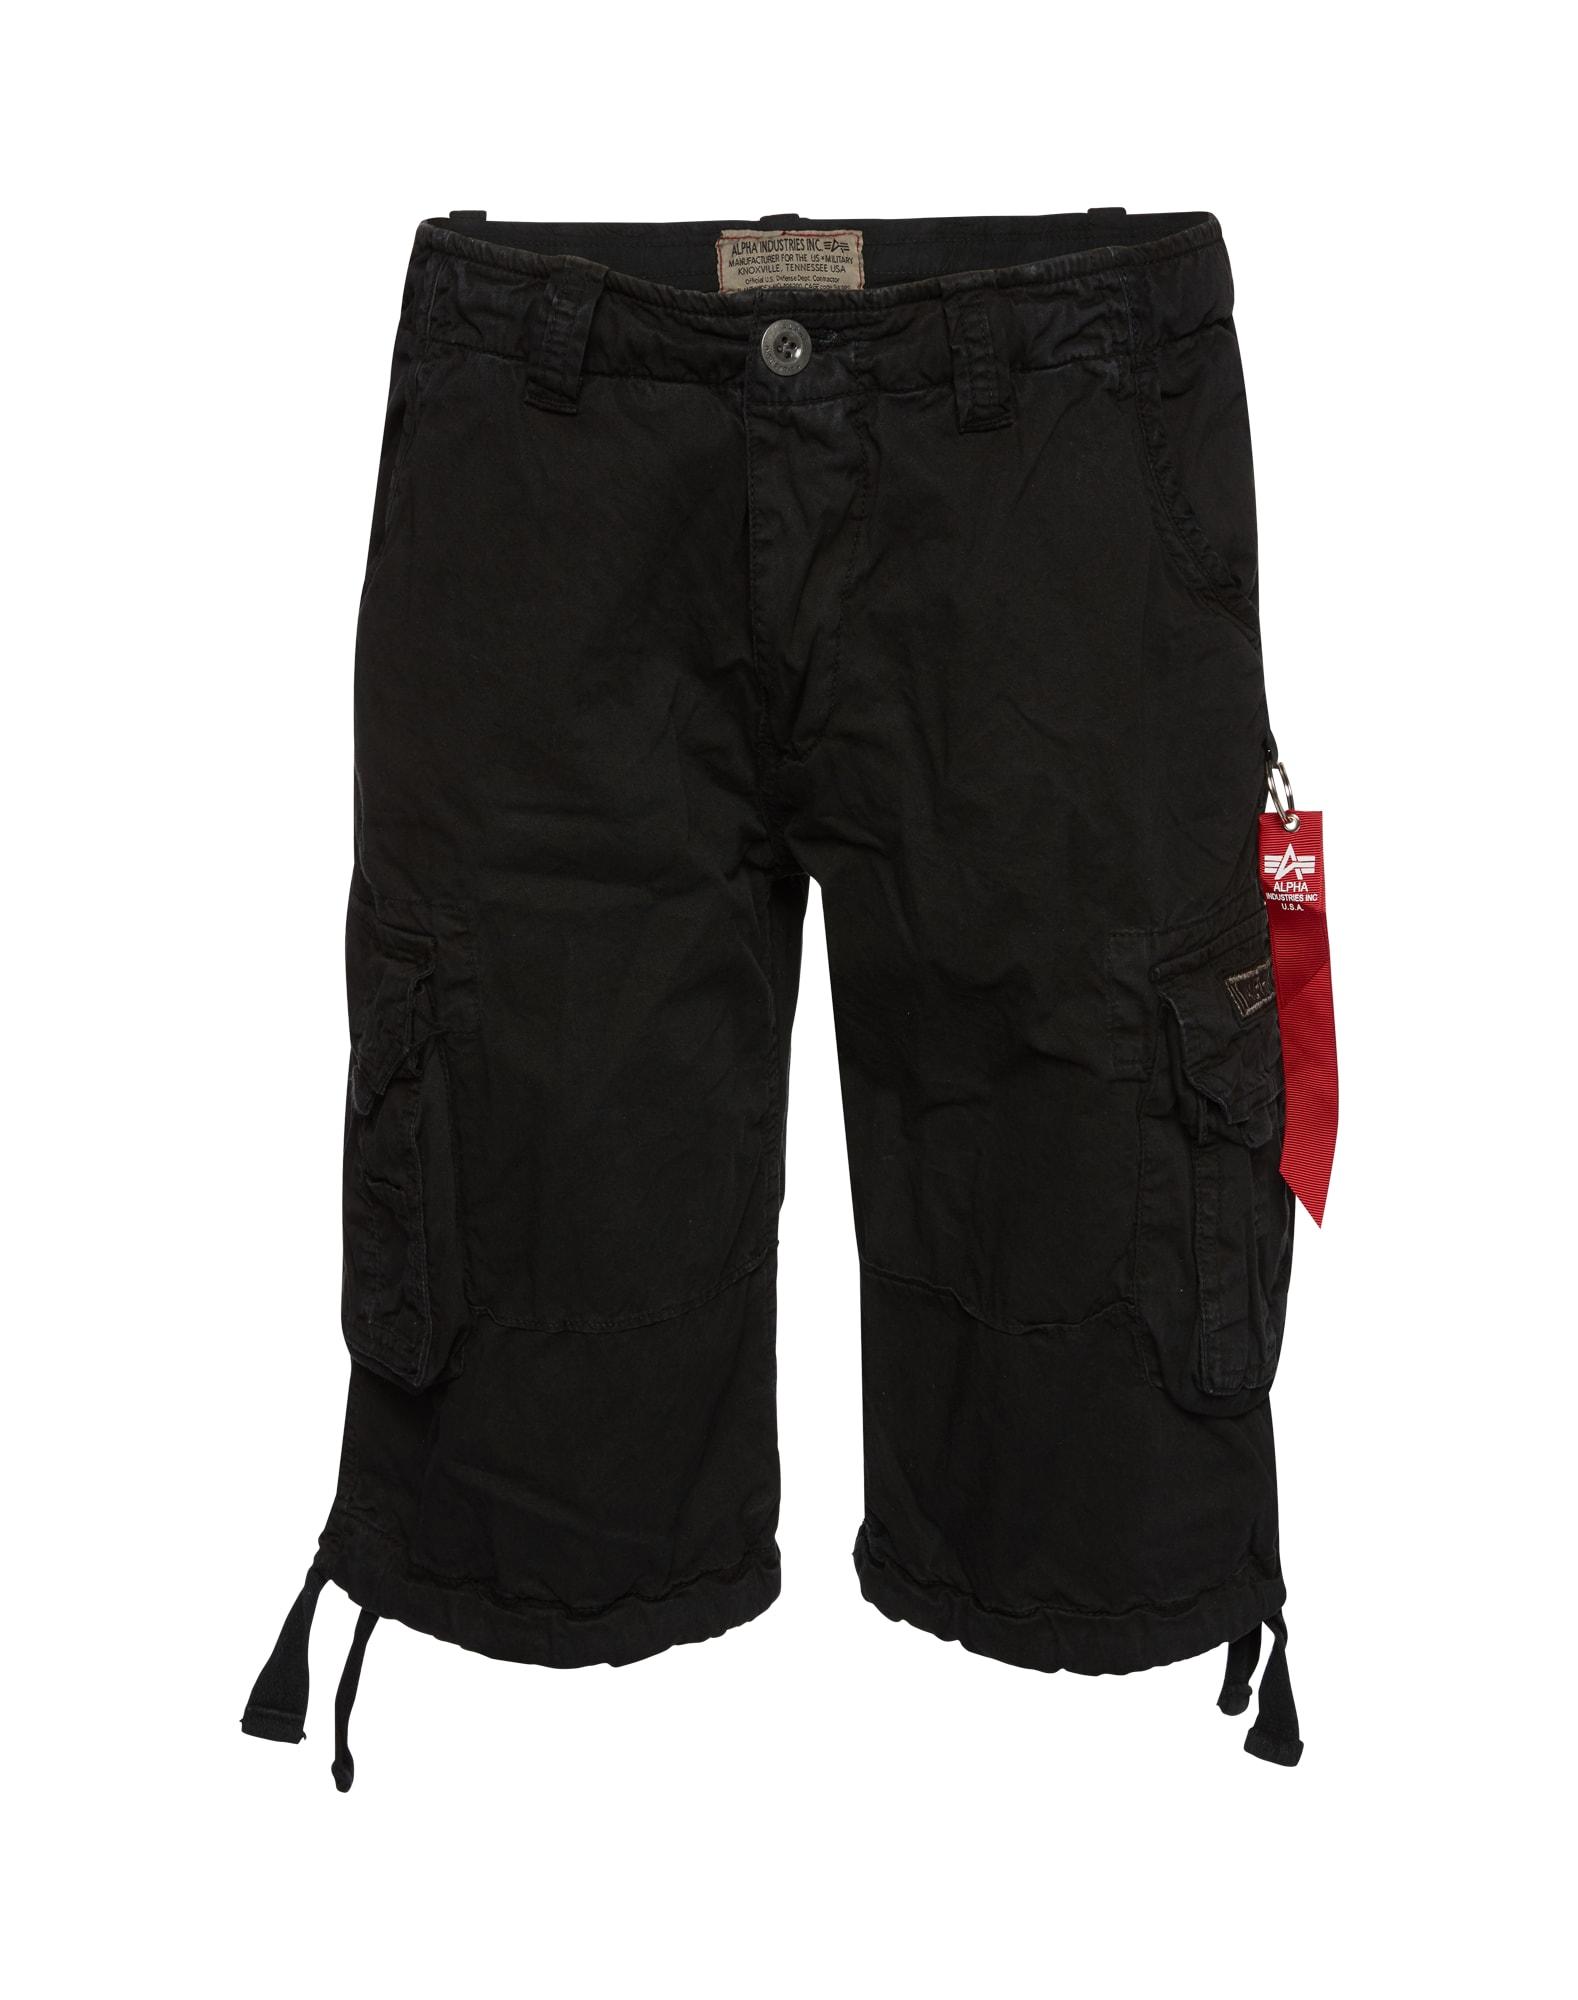 ALPHA INDUSTRIES Laisvo stiliaus kelnės 'Jet' juoda